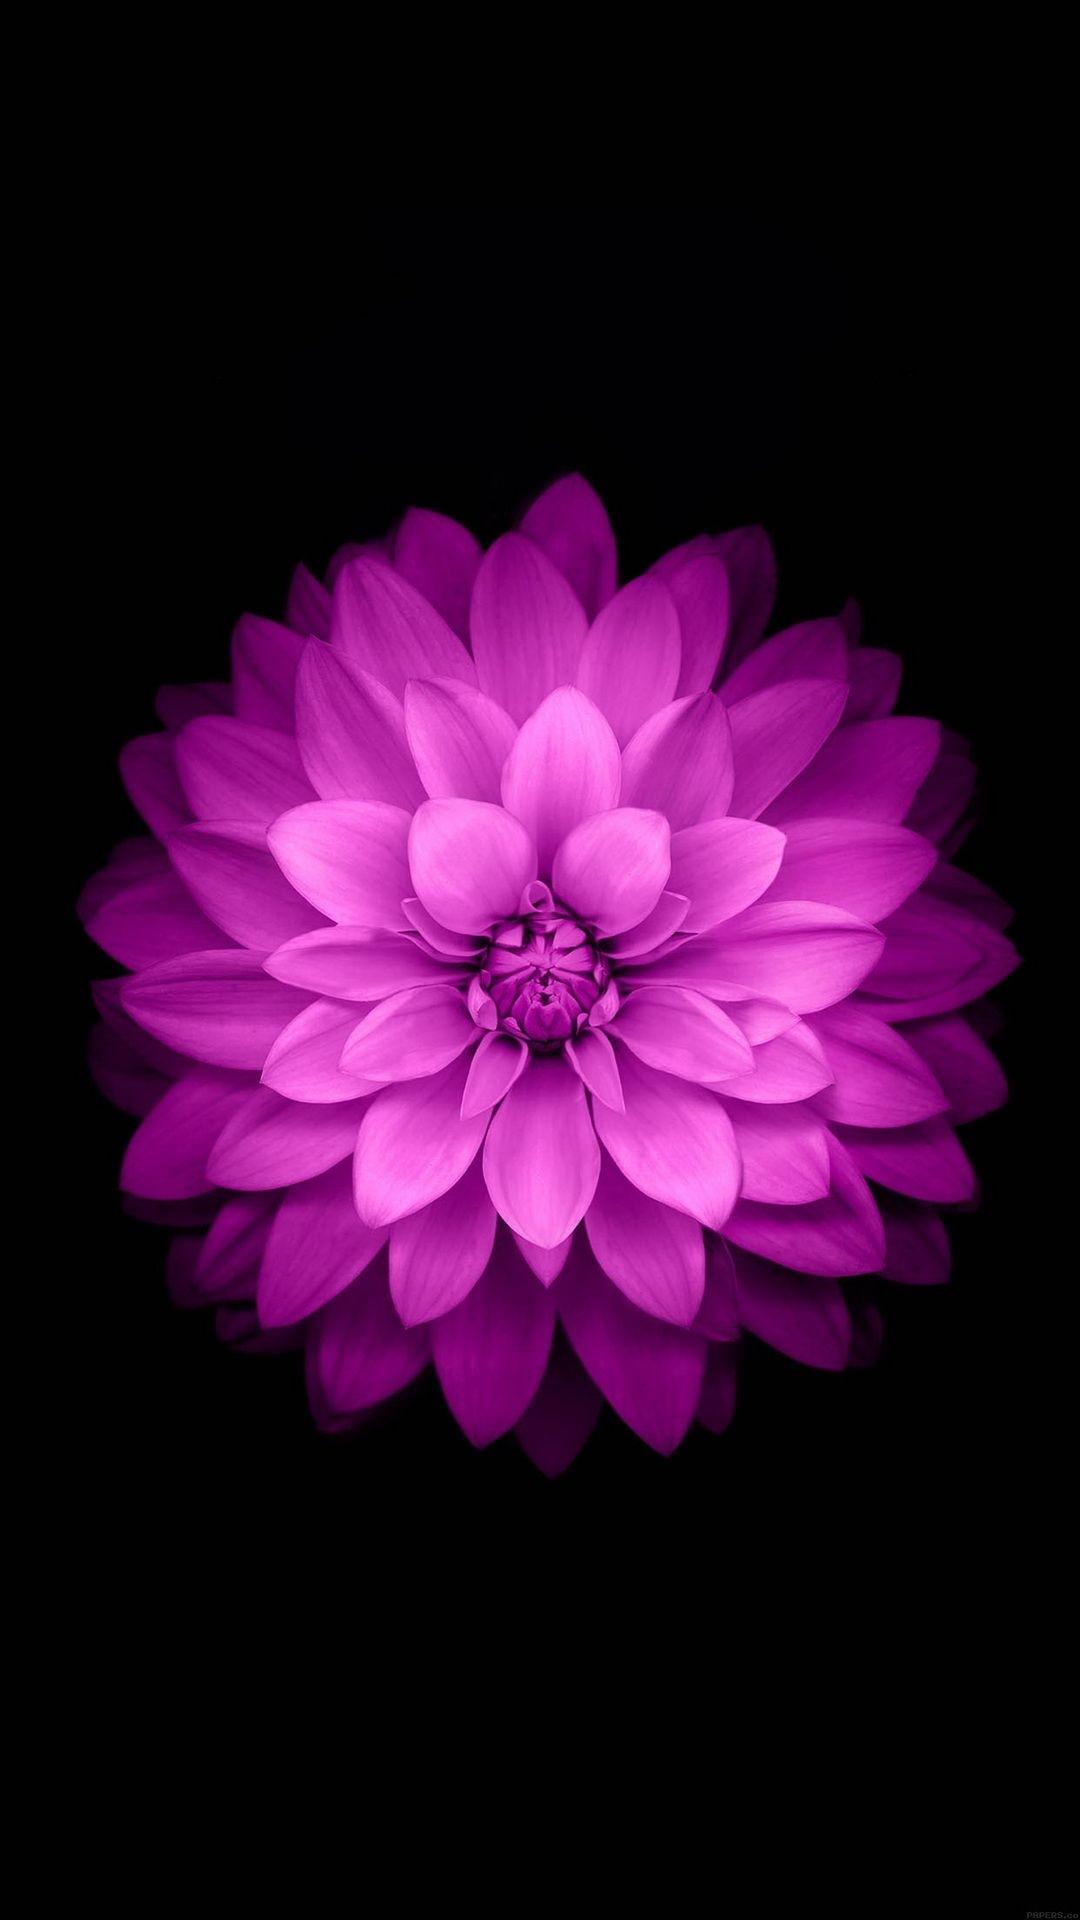 purple lotus black background   htc one wallpaper   pinterest